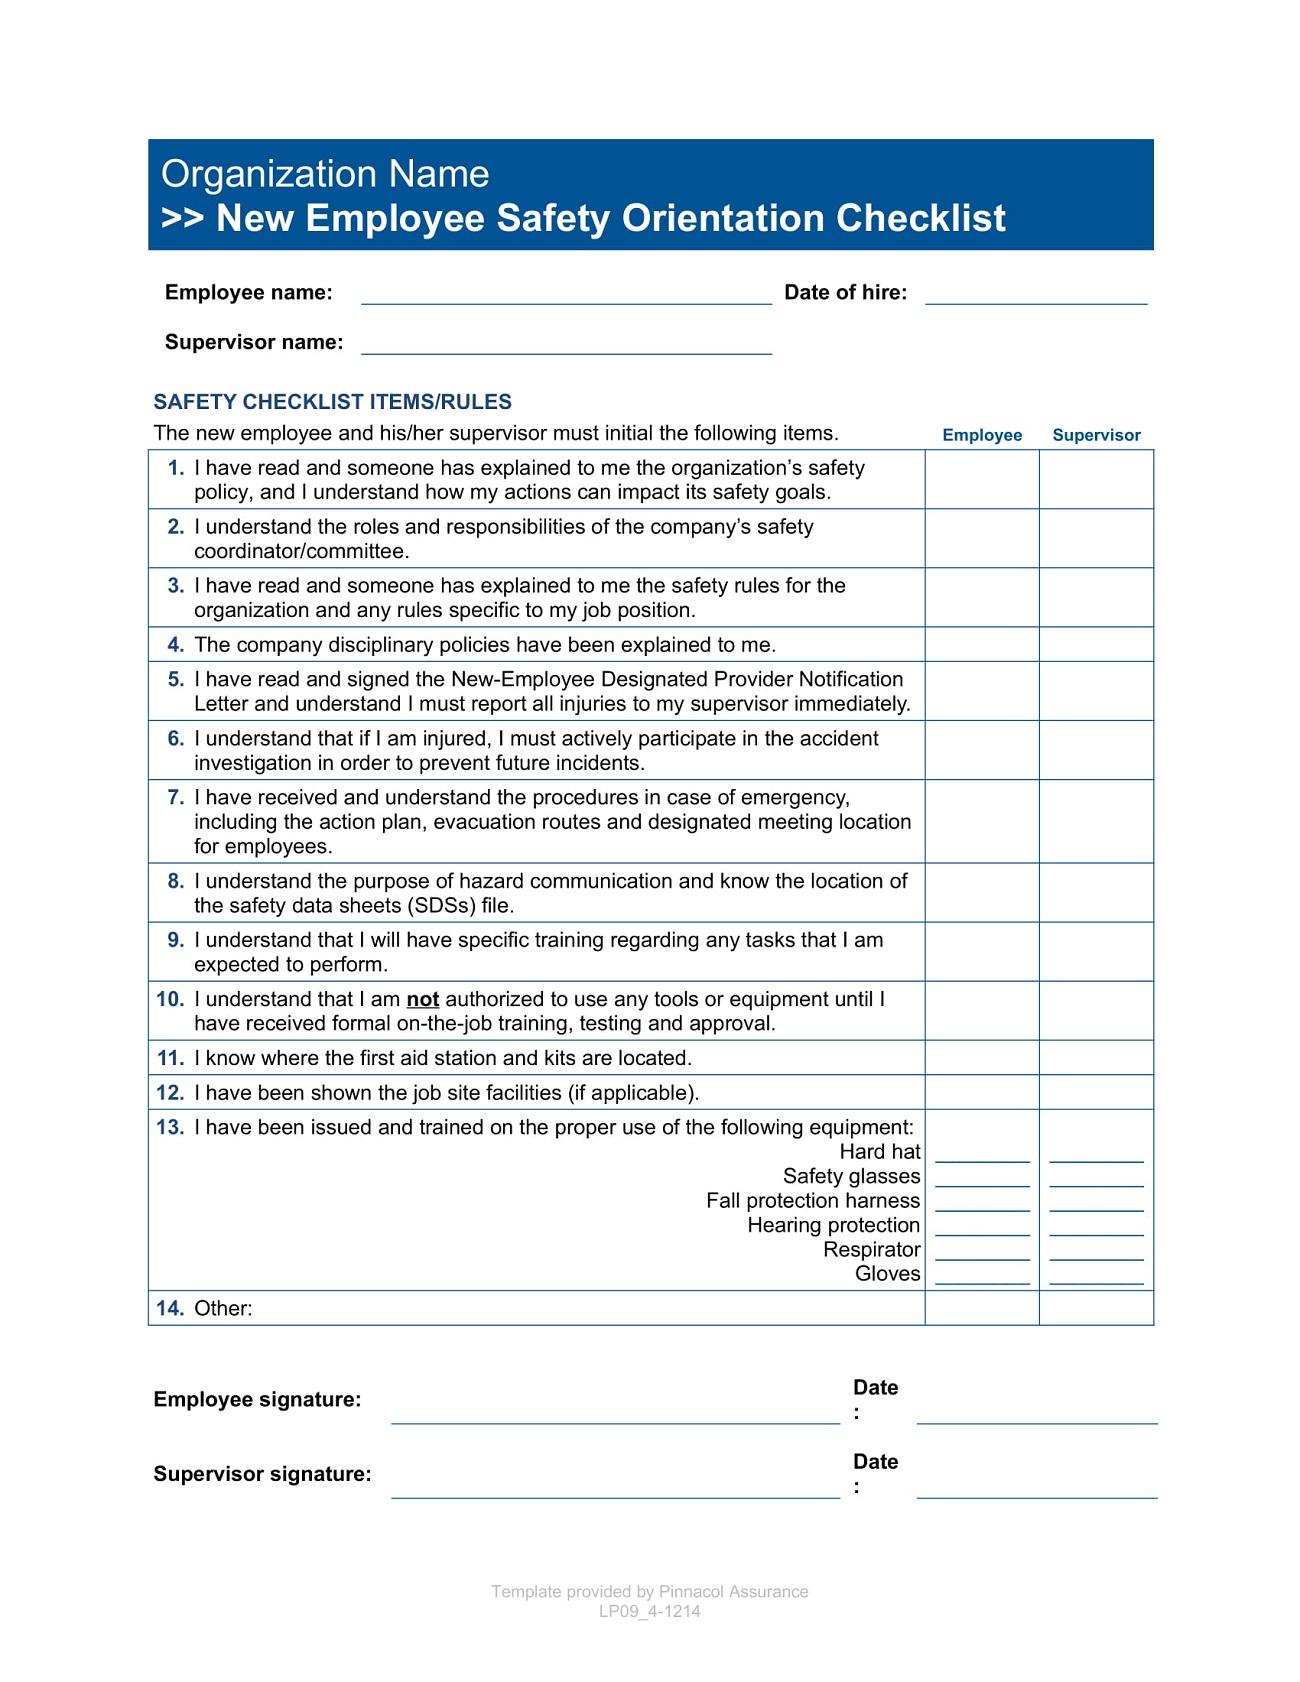 Form New Employee Safety Orientation Checklist Template Word